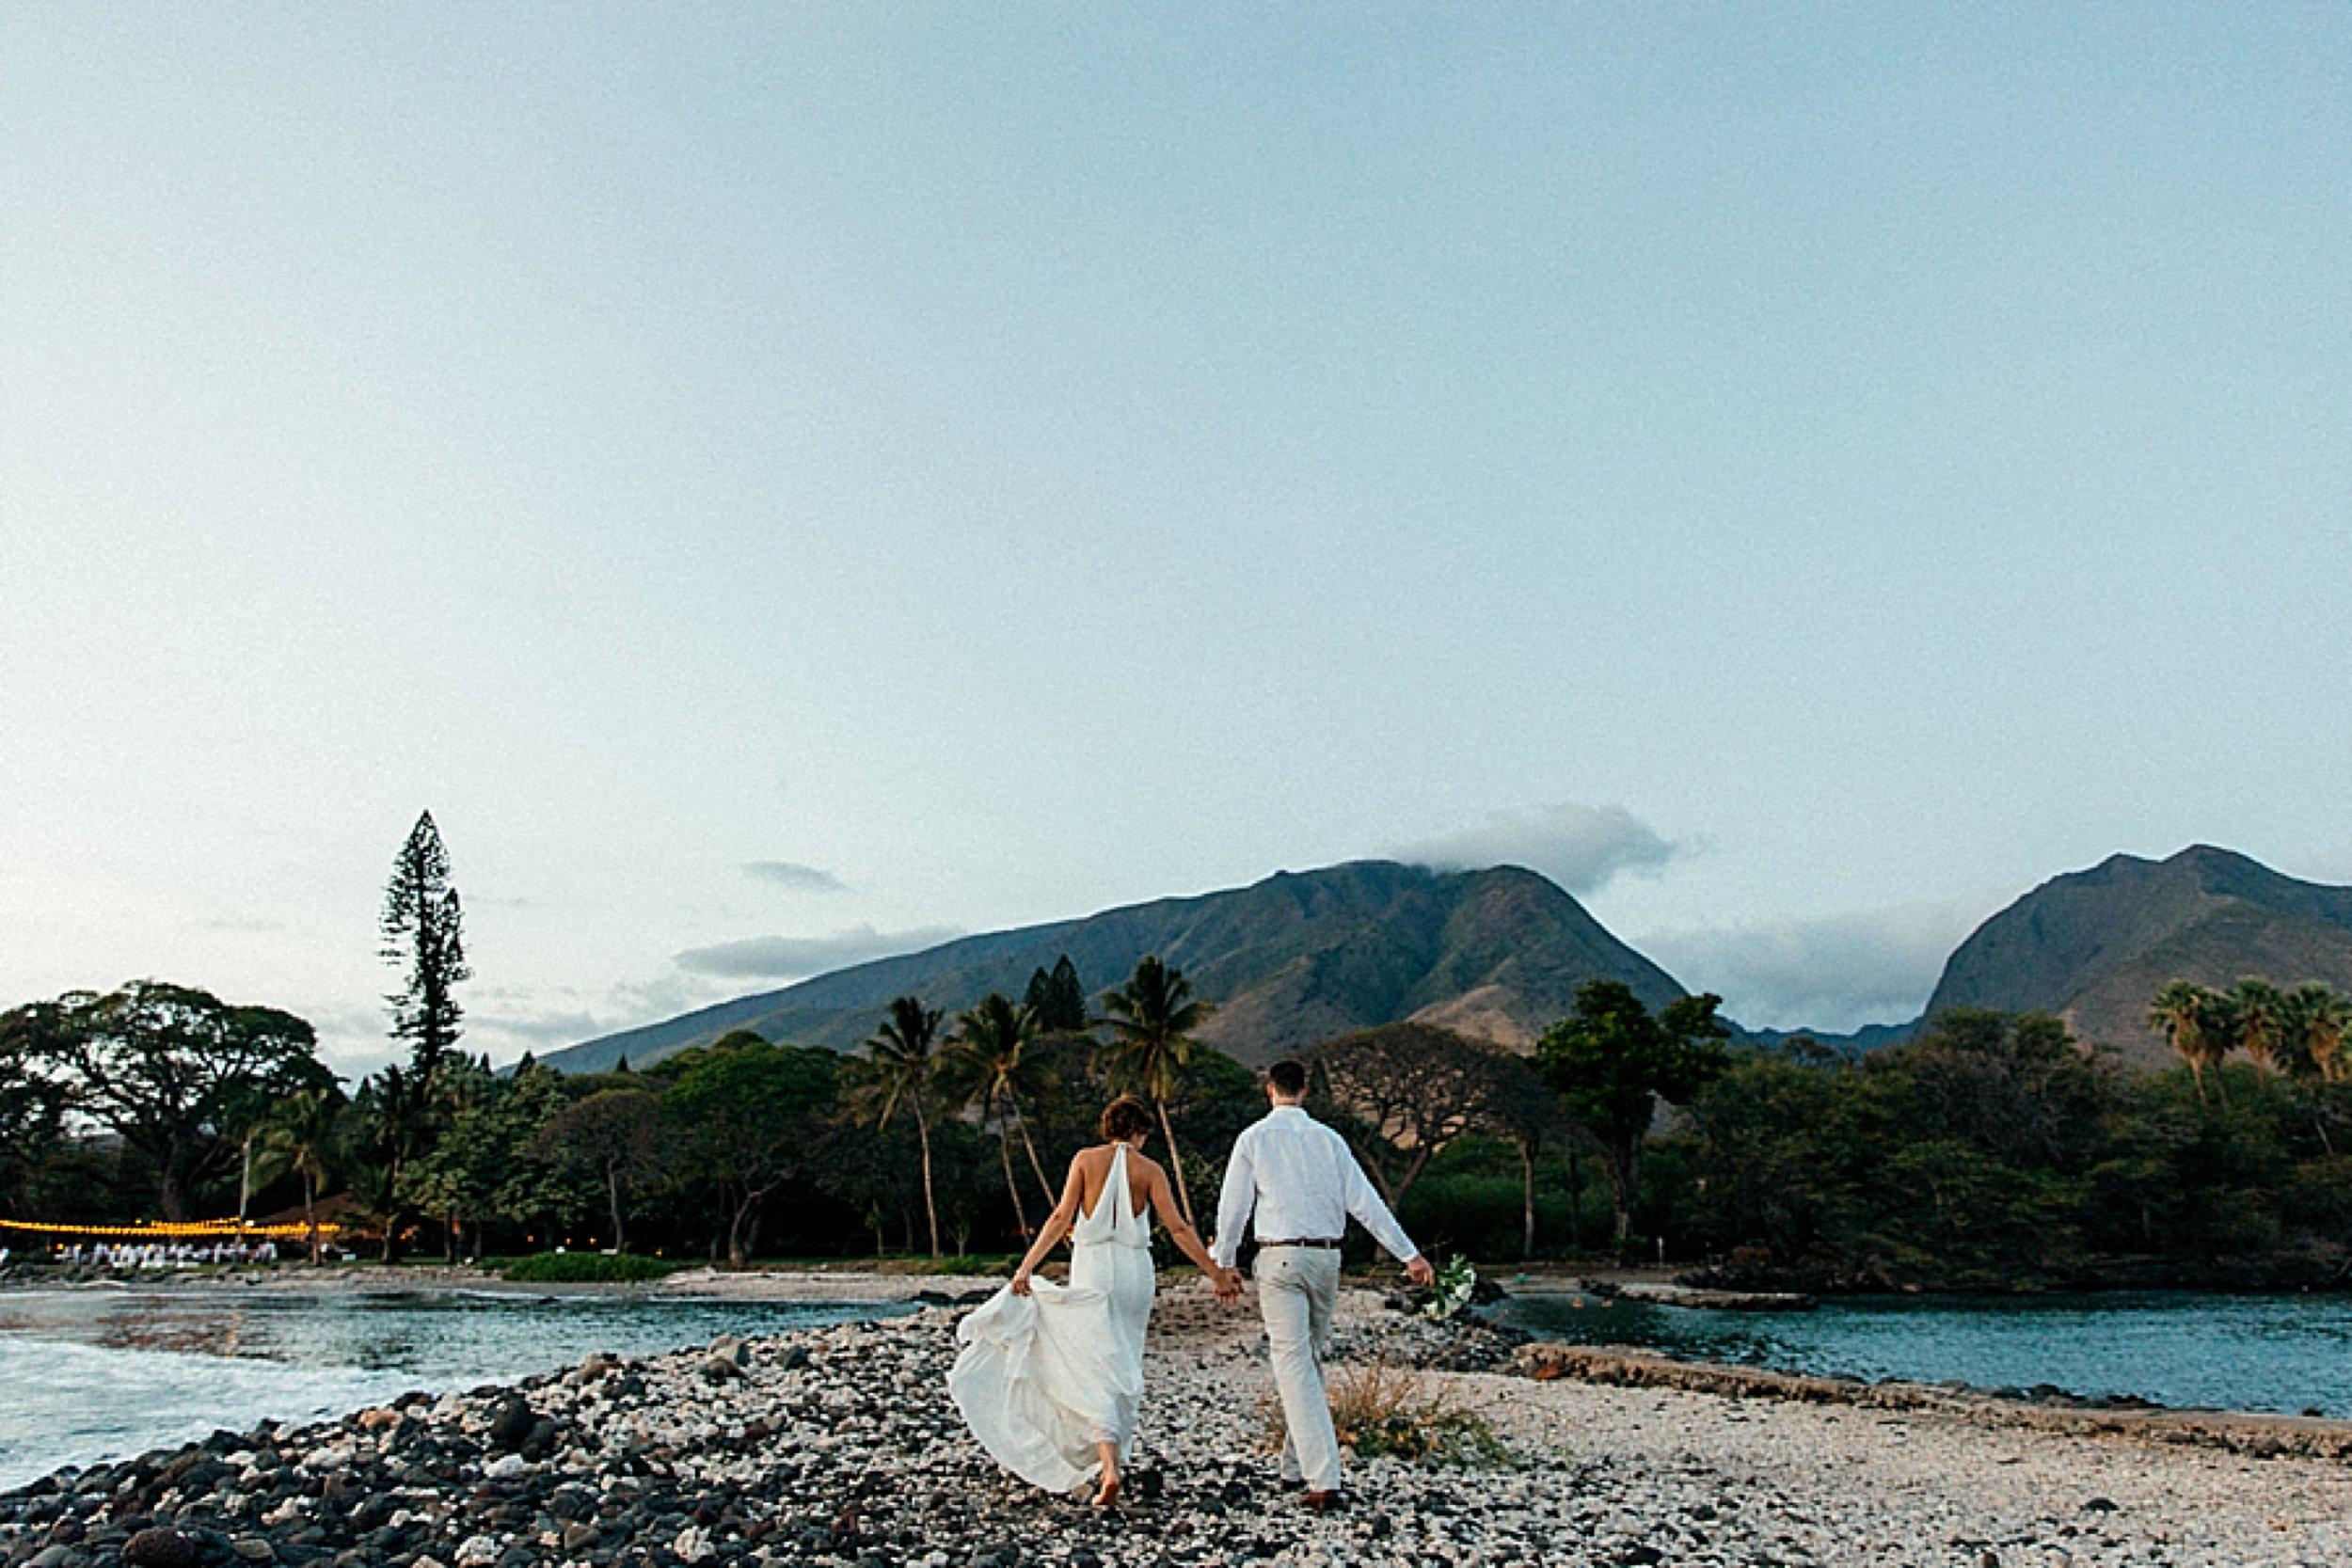 maui-wedding-at-olowalu-plantation-house_0103.jpg